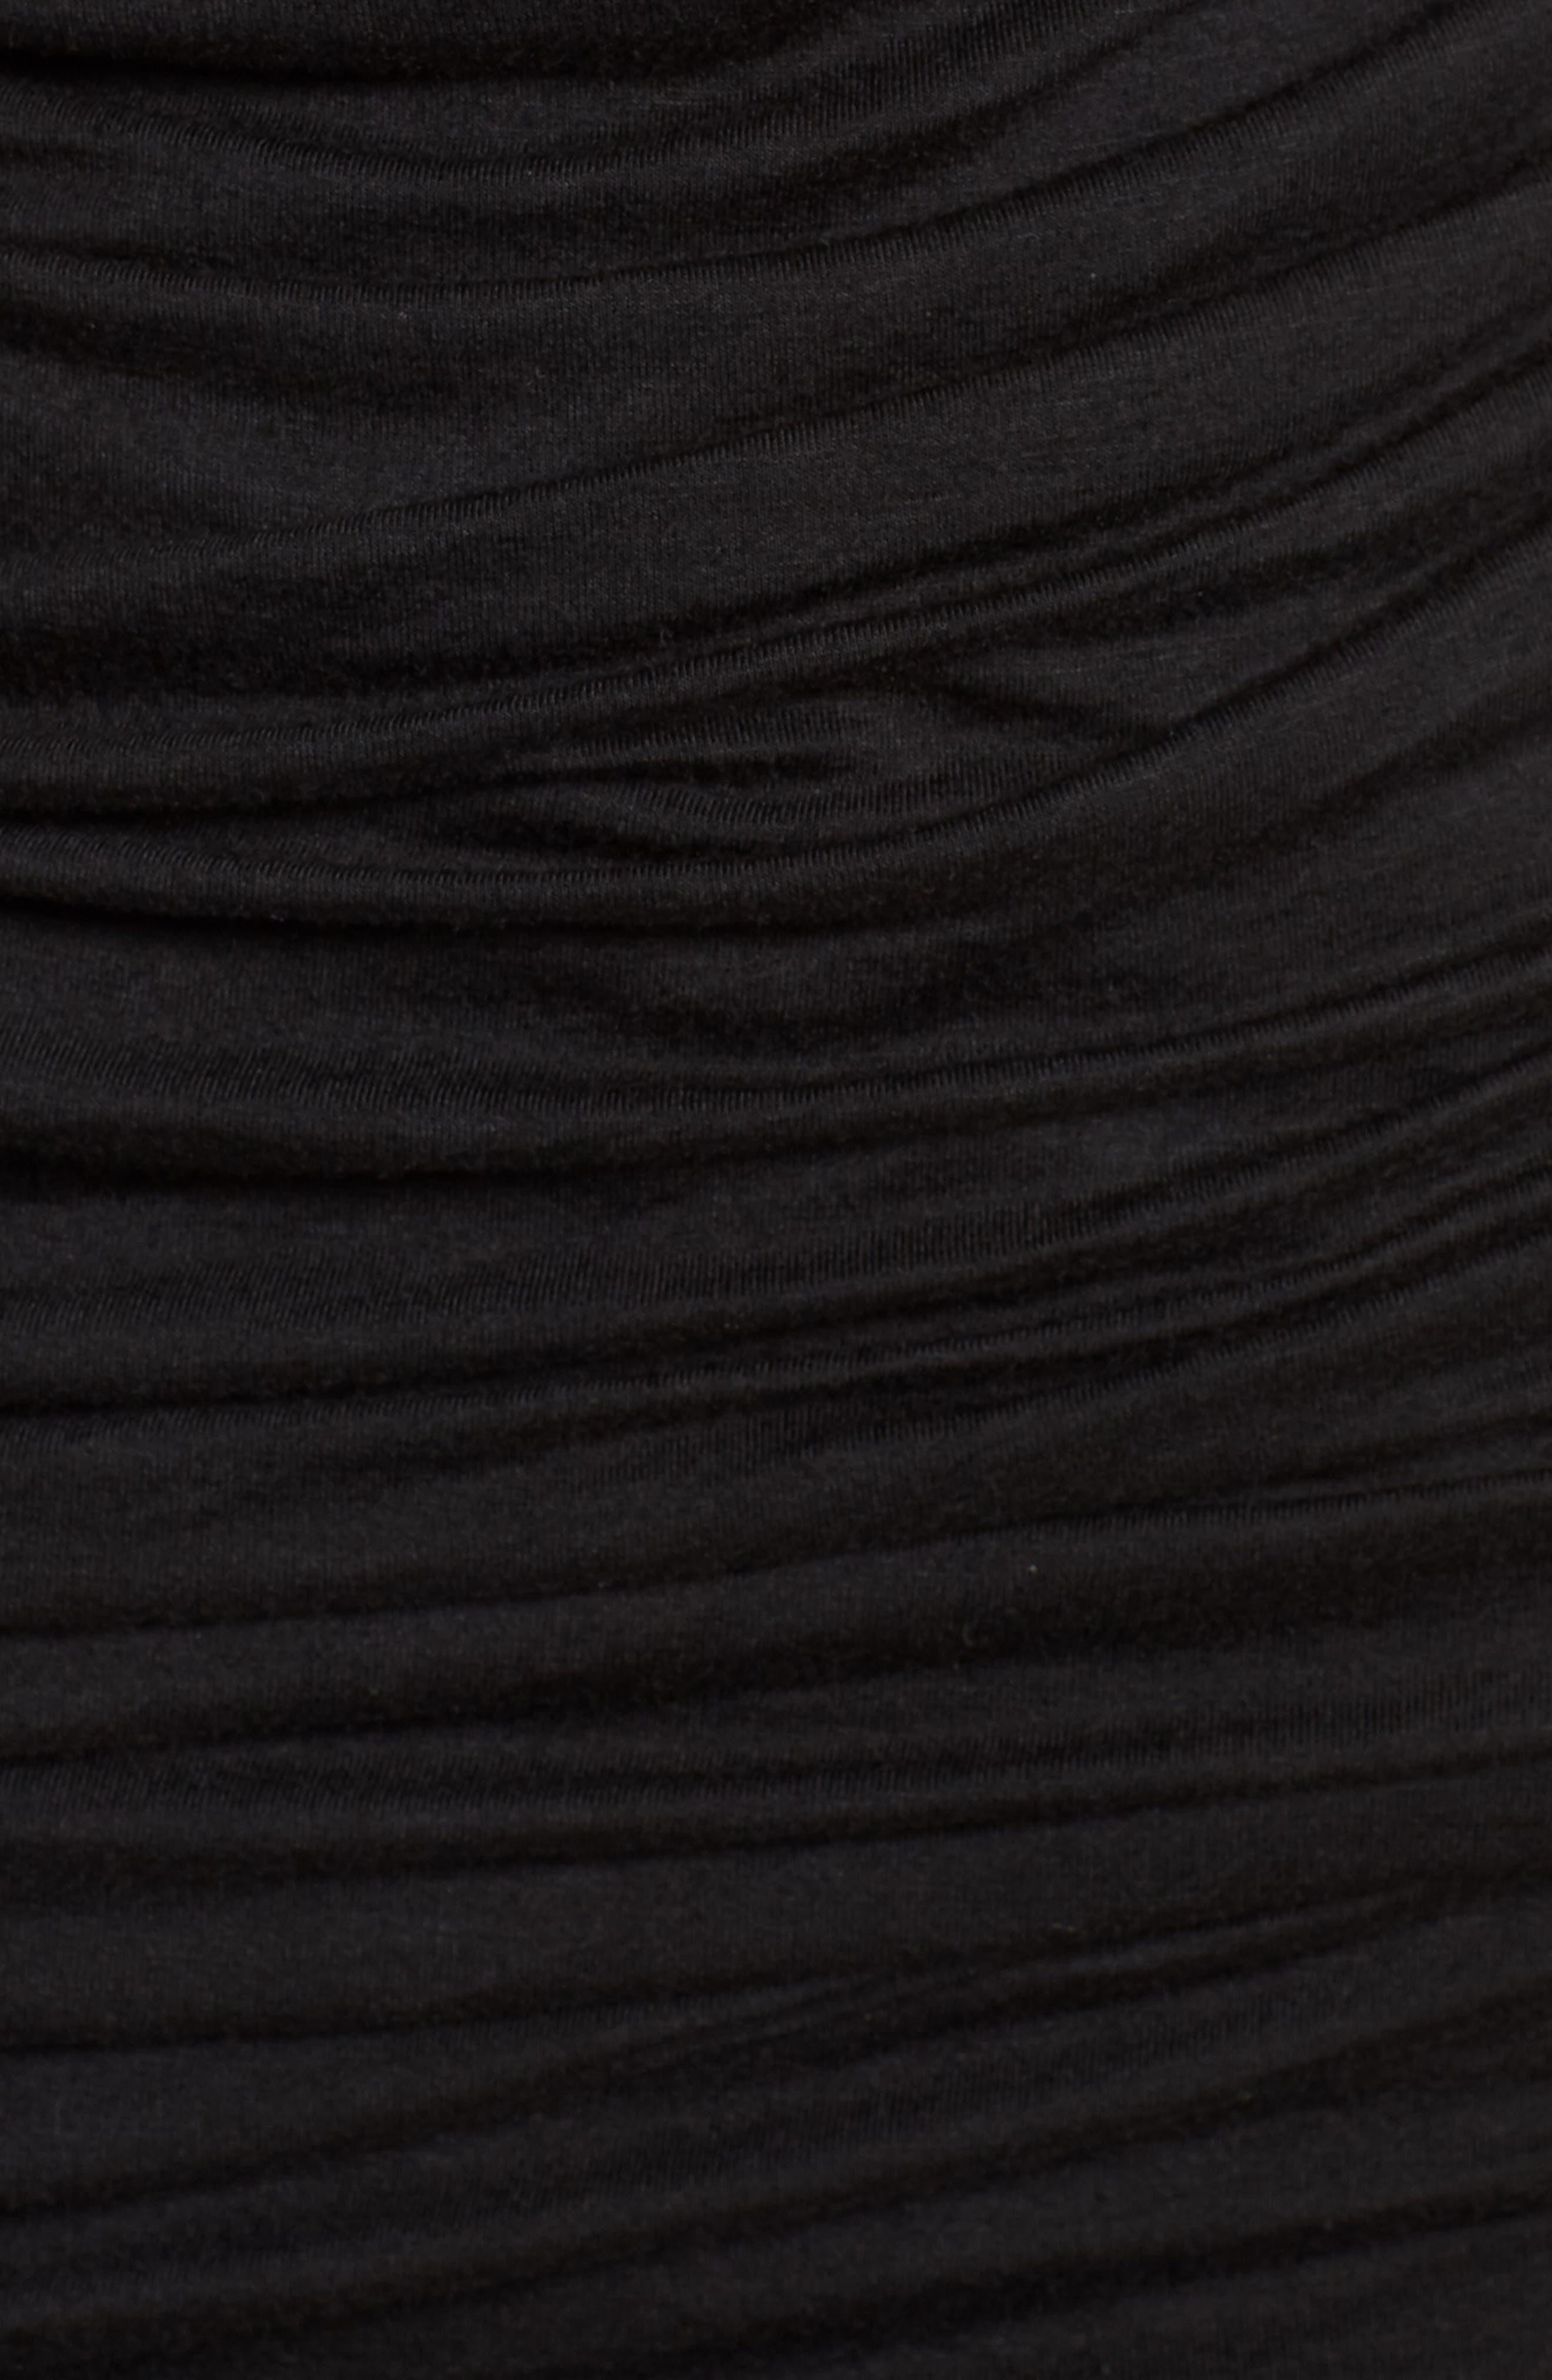 Ruched Sheath Dress,                             Alternate thumbnail 6, color,                             Black Multi